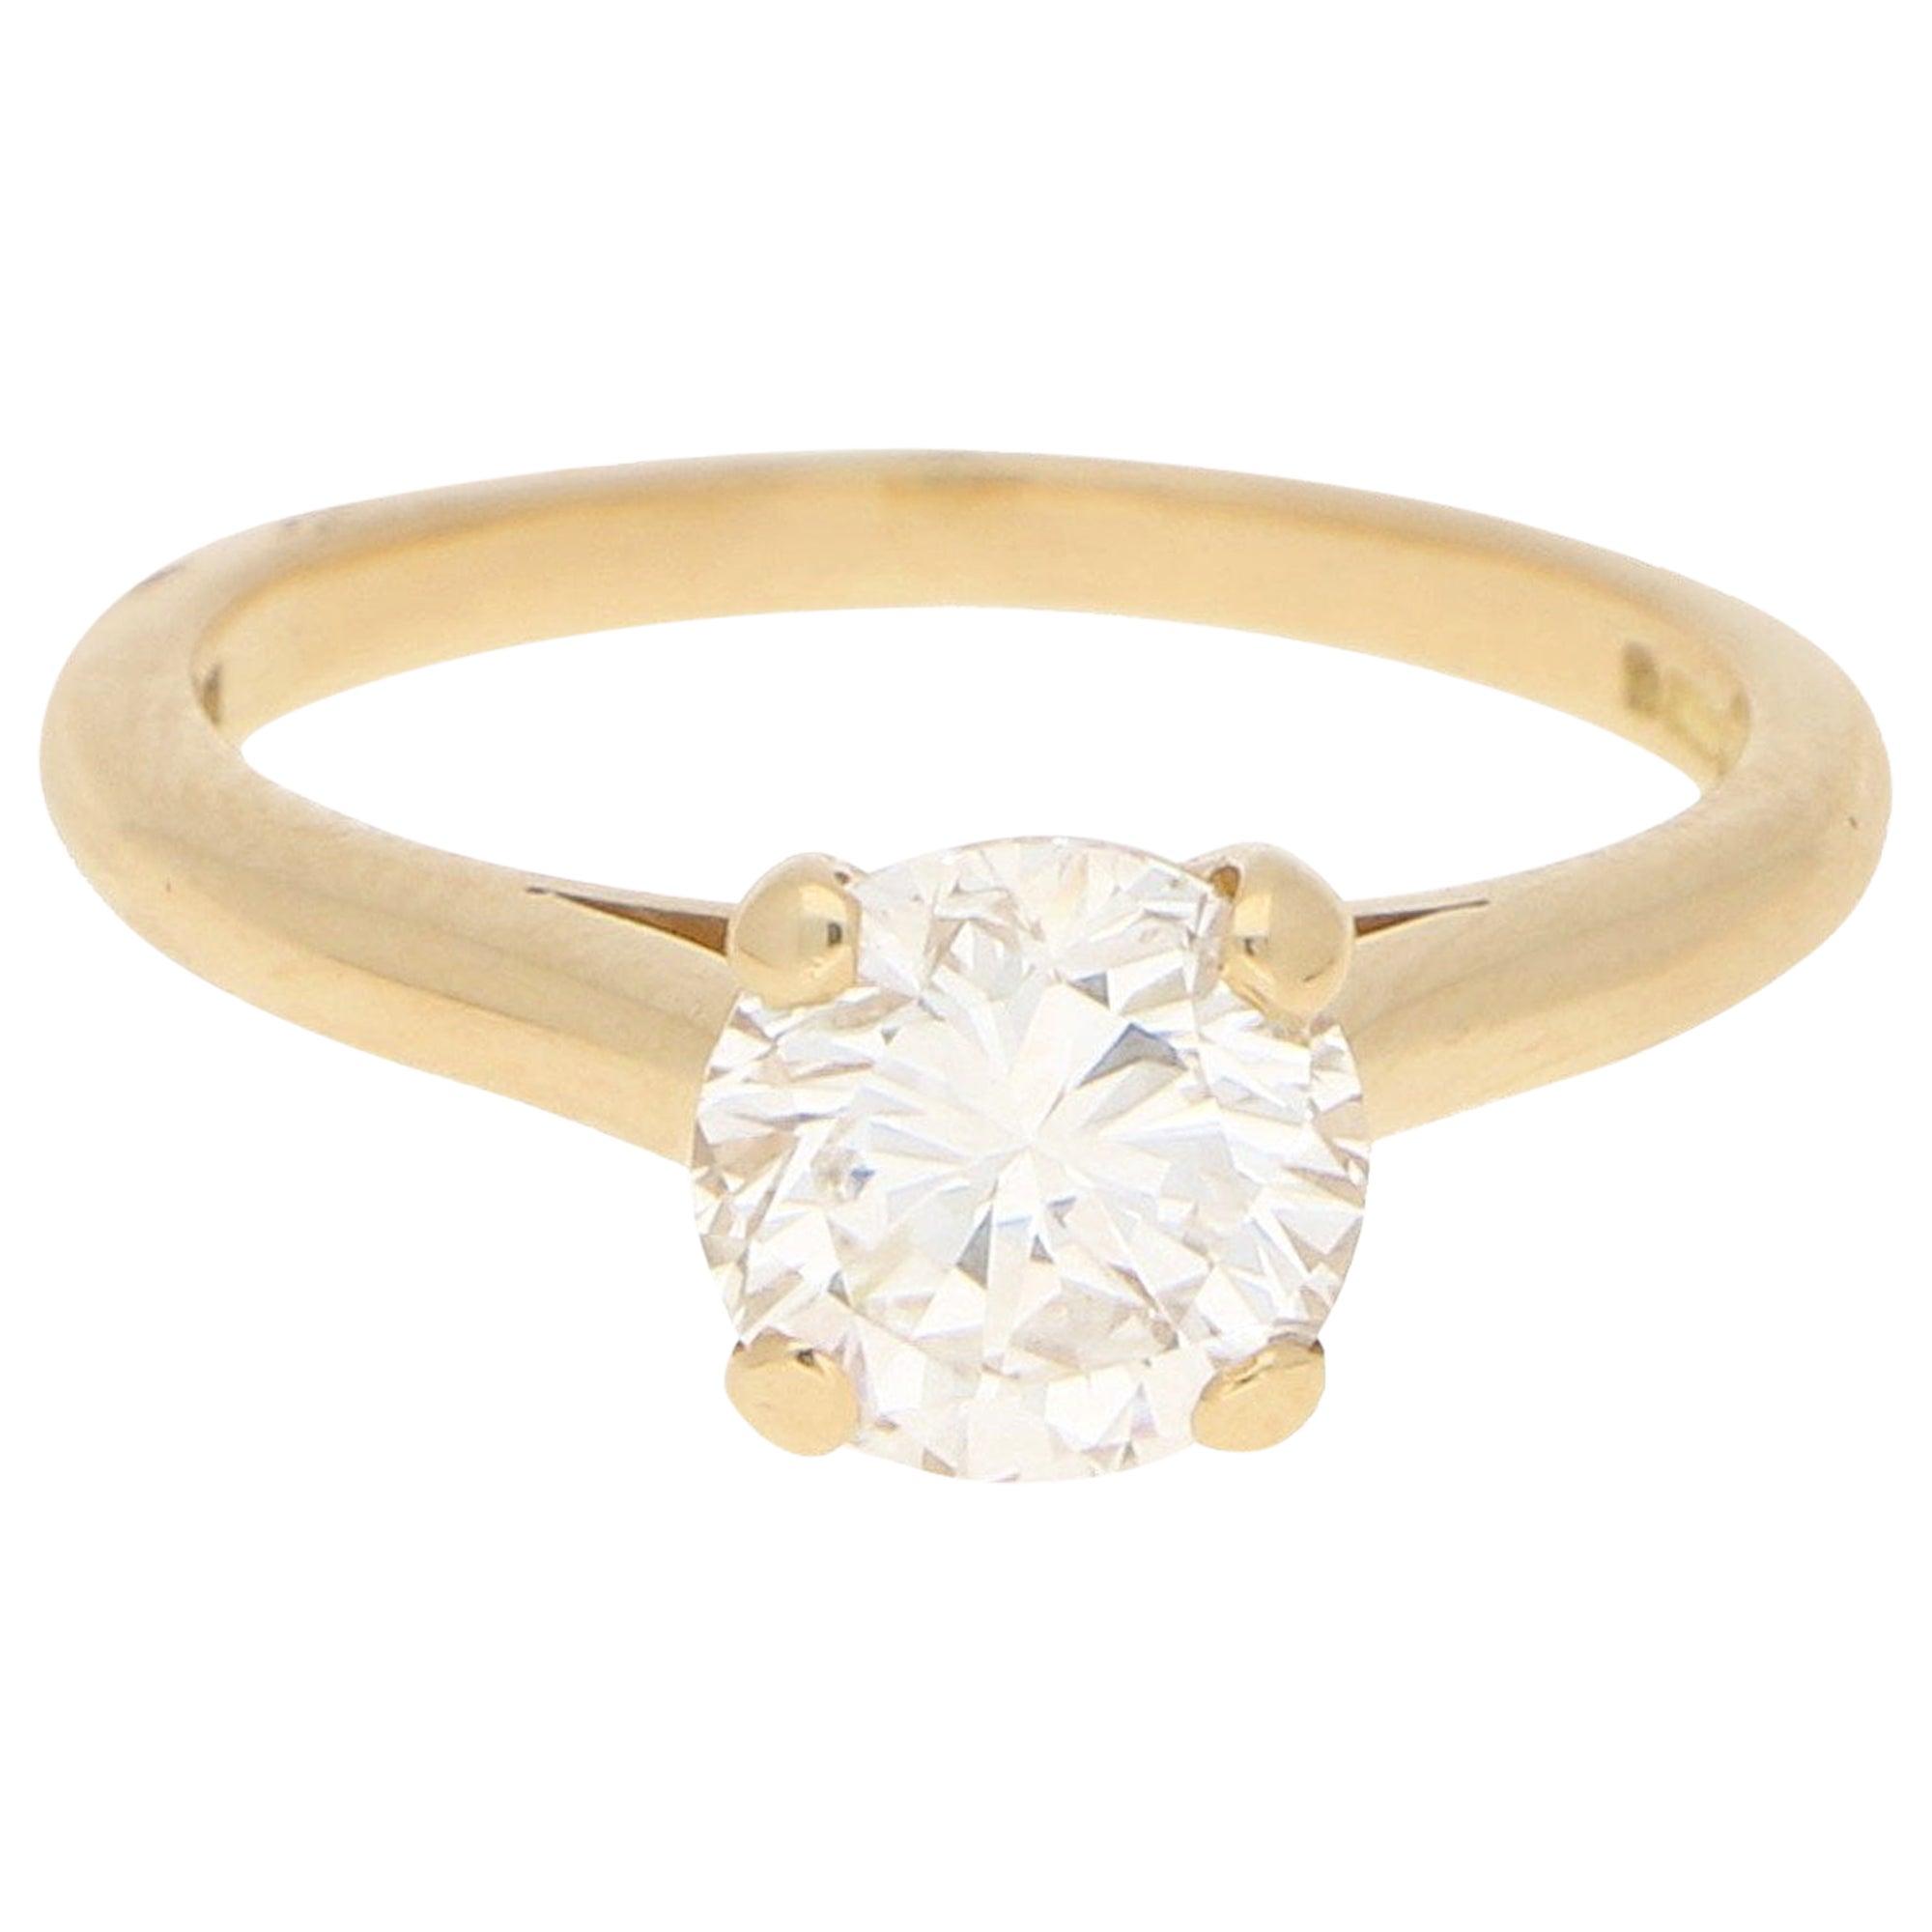 Cartier Certified 1.25 Carat Solitaire Engagement Ring Set in 18 Karat Gold